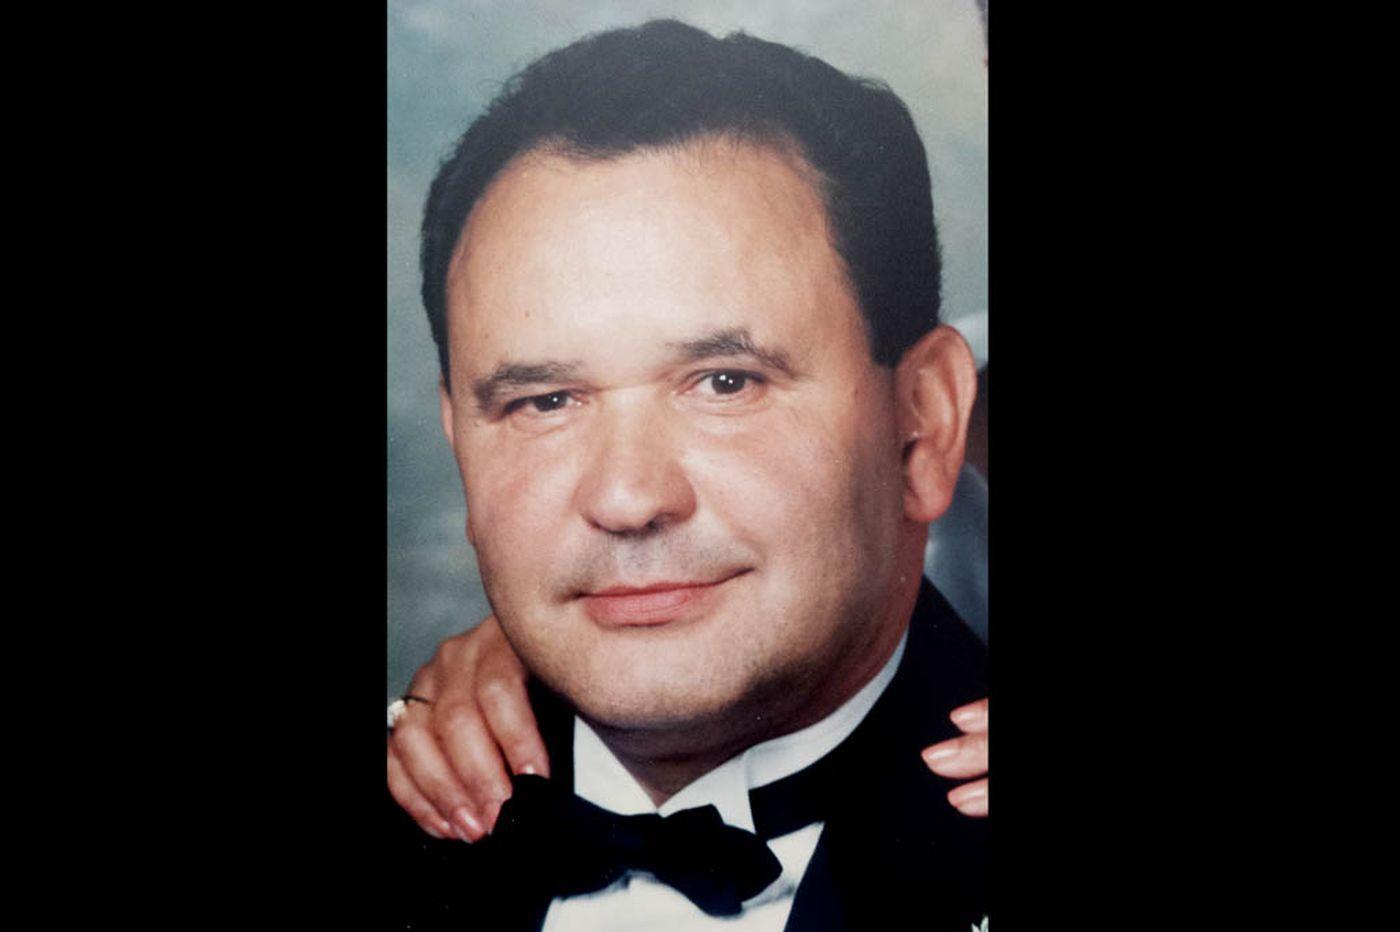 Family fondly recalls man, 75, killed by truck in Rhawnhurst